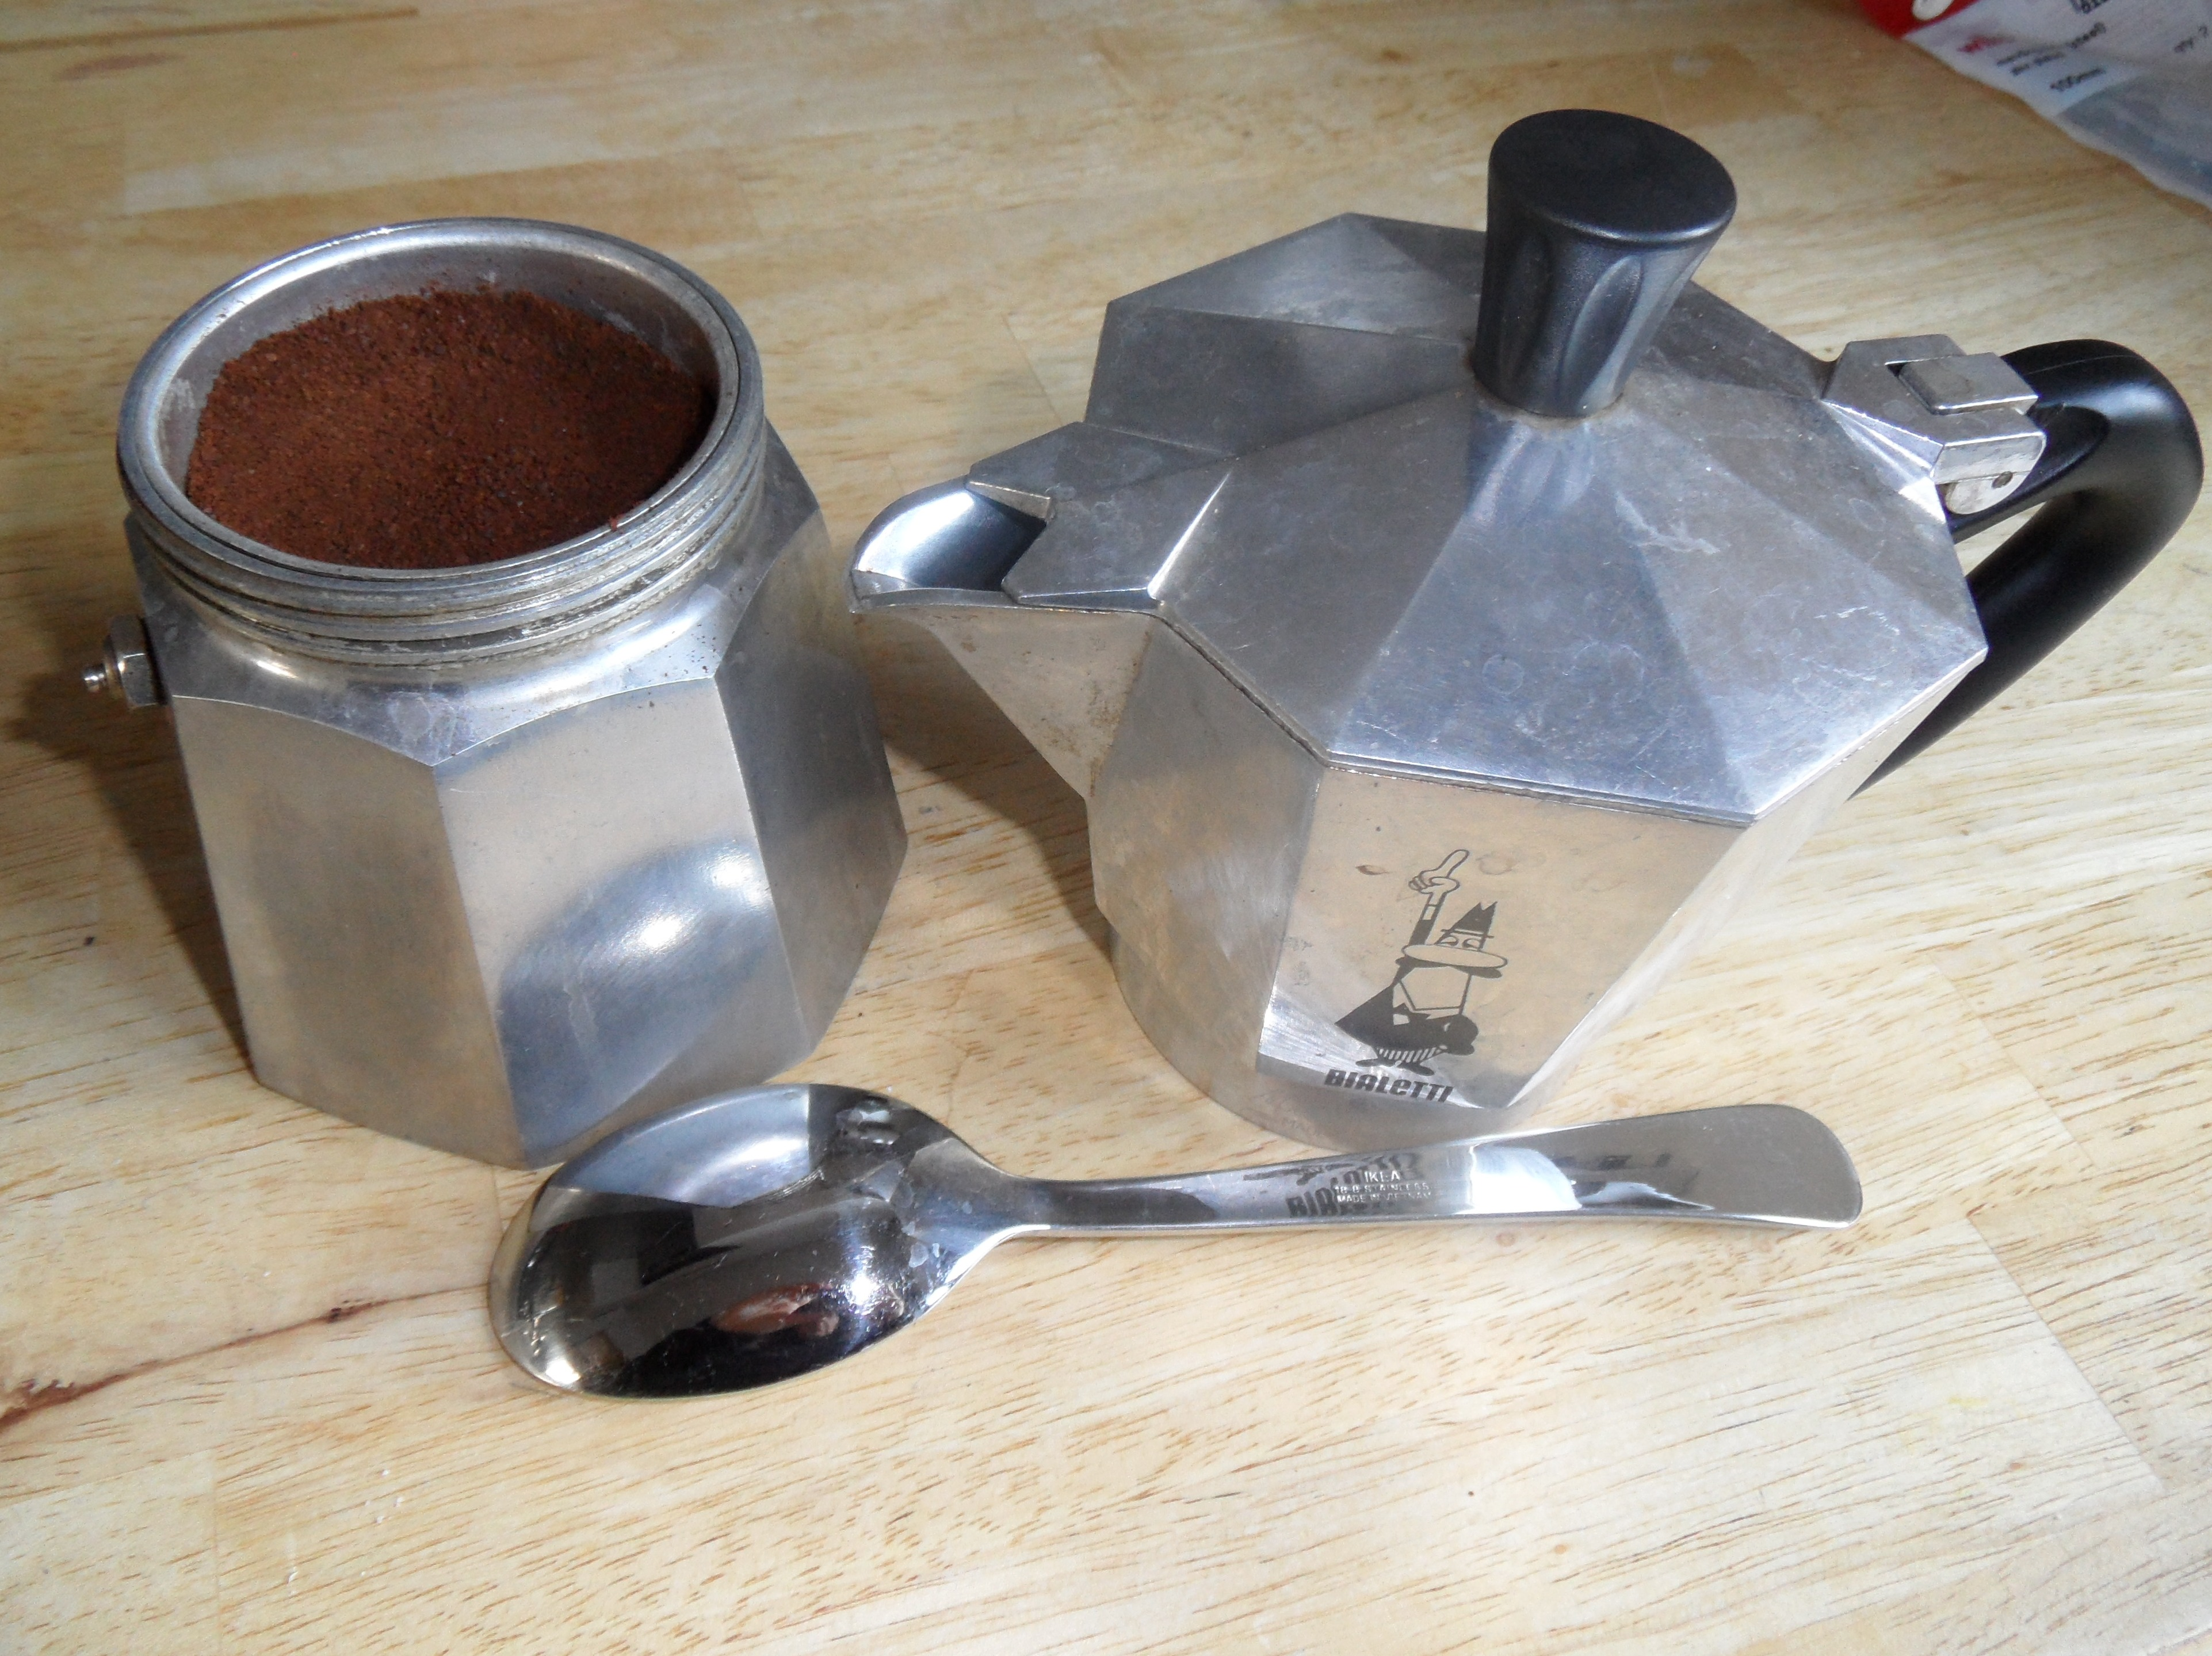 How to make Cappuccino greenemporium